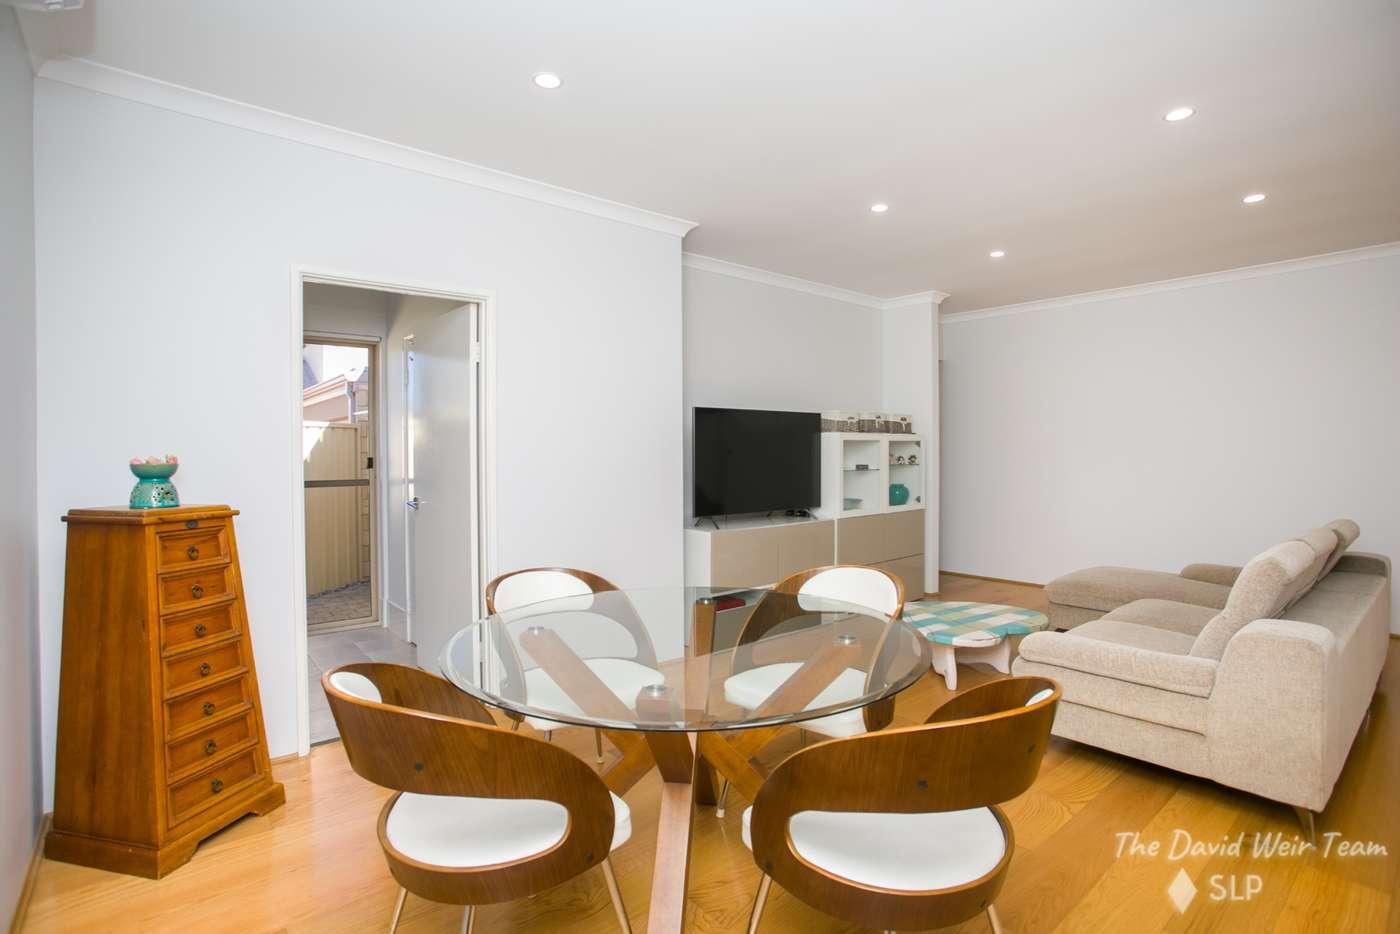 Fifth view of Homely house listing, 5 Maltarra Street, Nollamara WA 6061